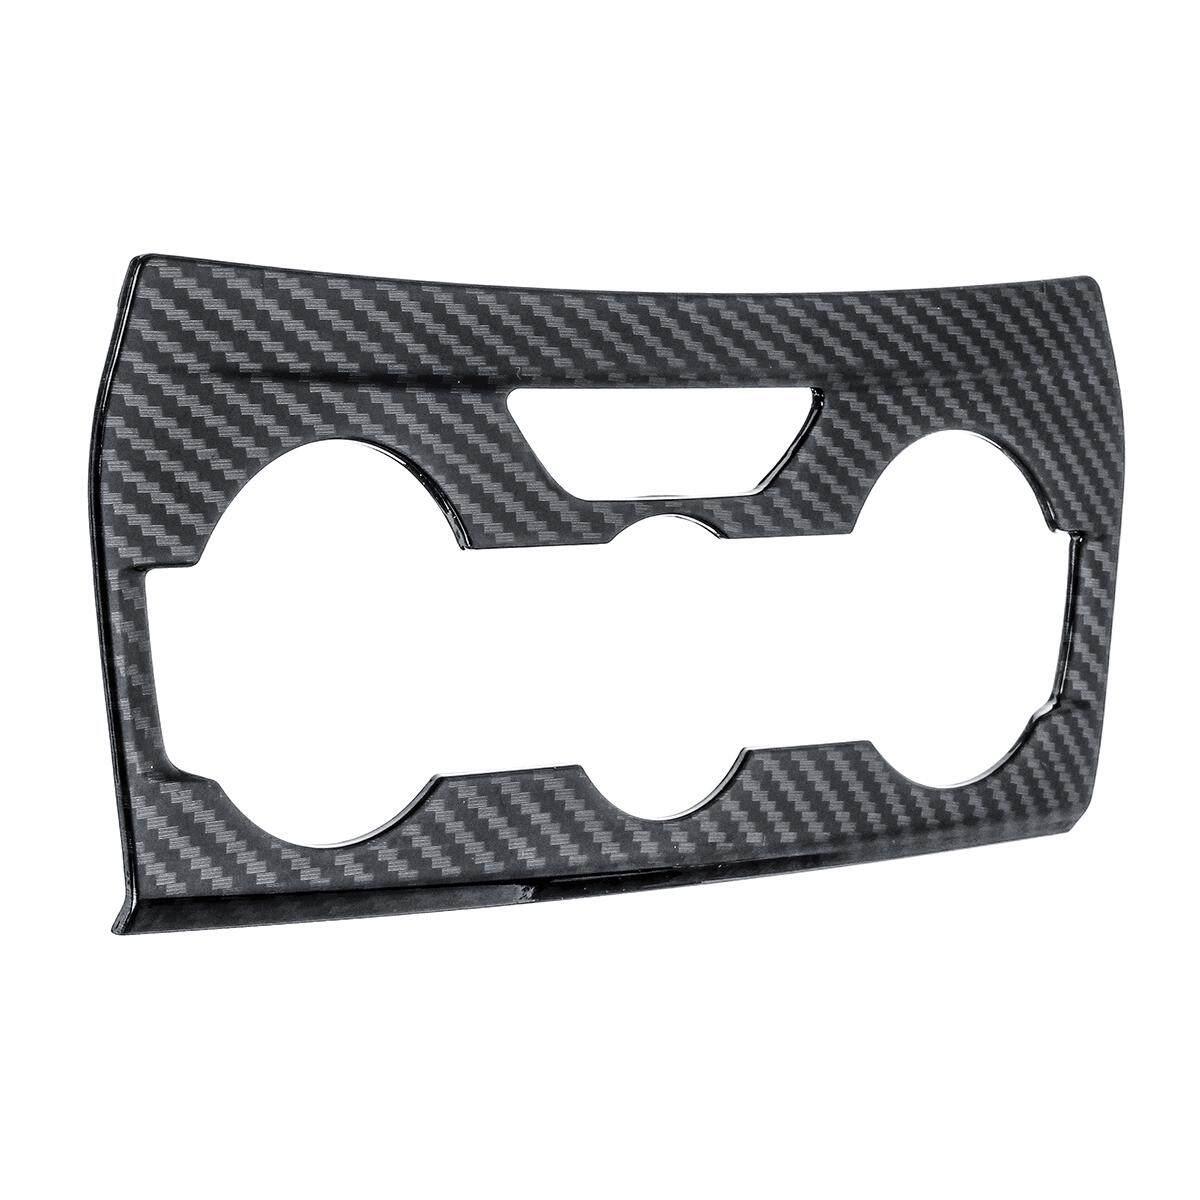 Untuk Subaru Crosstrek XV 2018 Dashboard A/C Sakelar Lampu Peringatan Trim Pelindung Serat Karbon